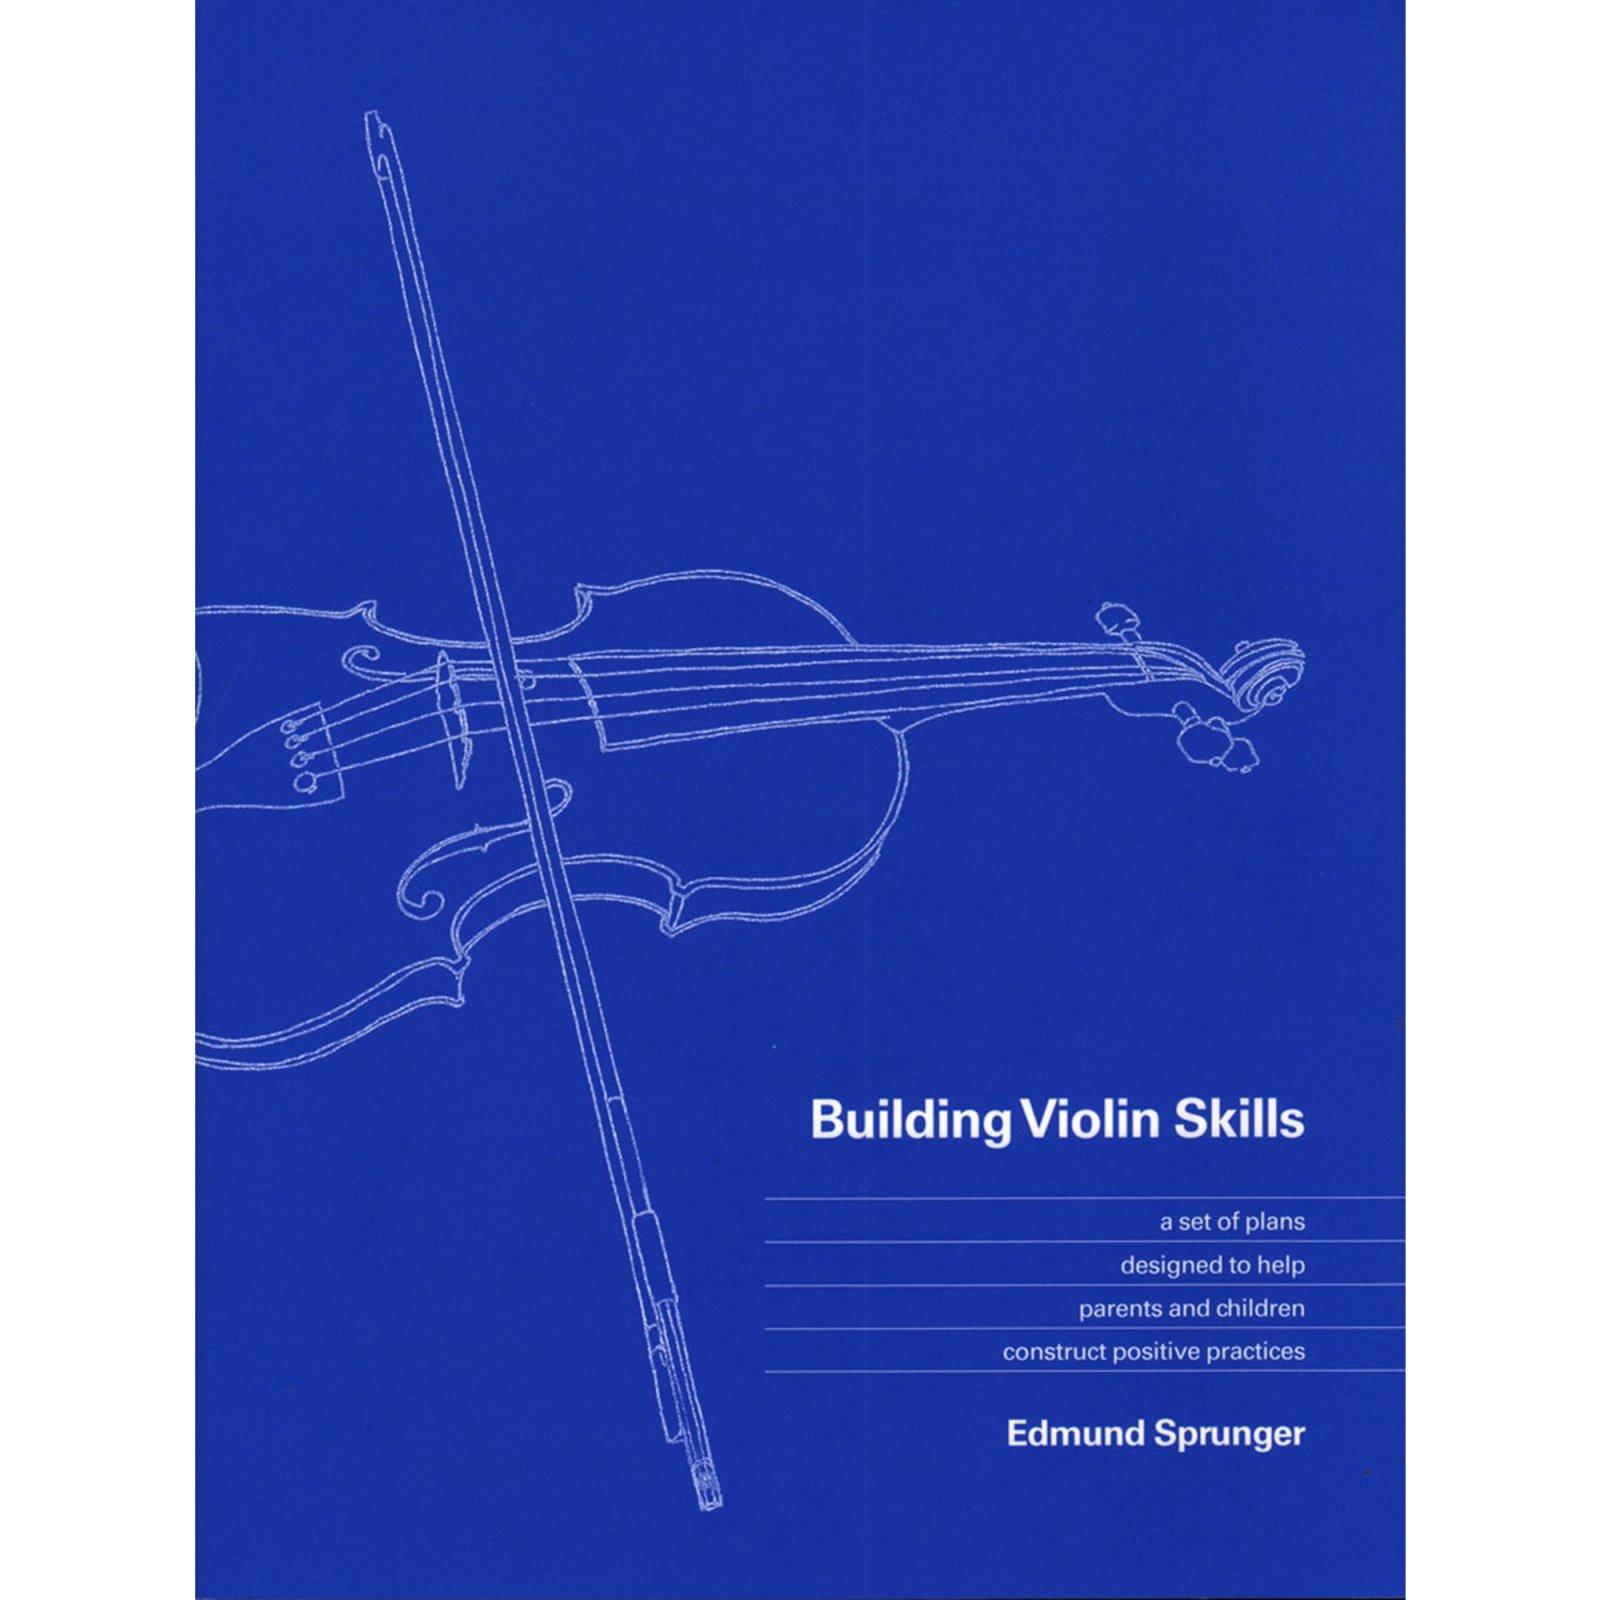 Building Violin Skills, by Edmund Sprunger